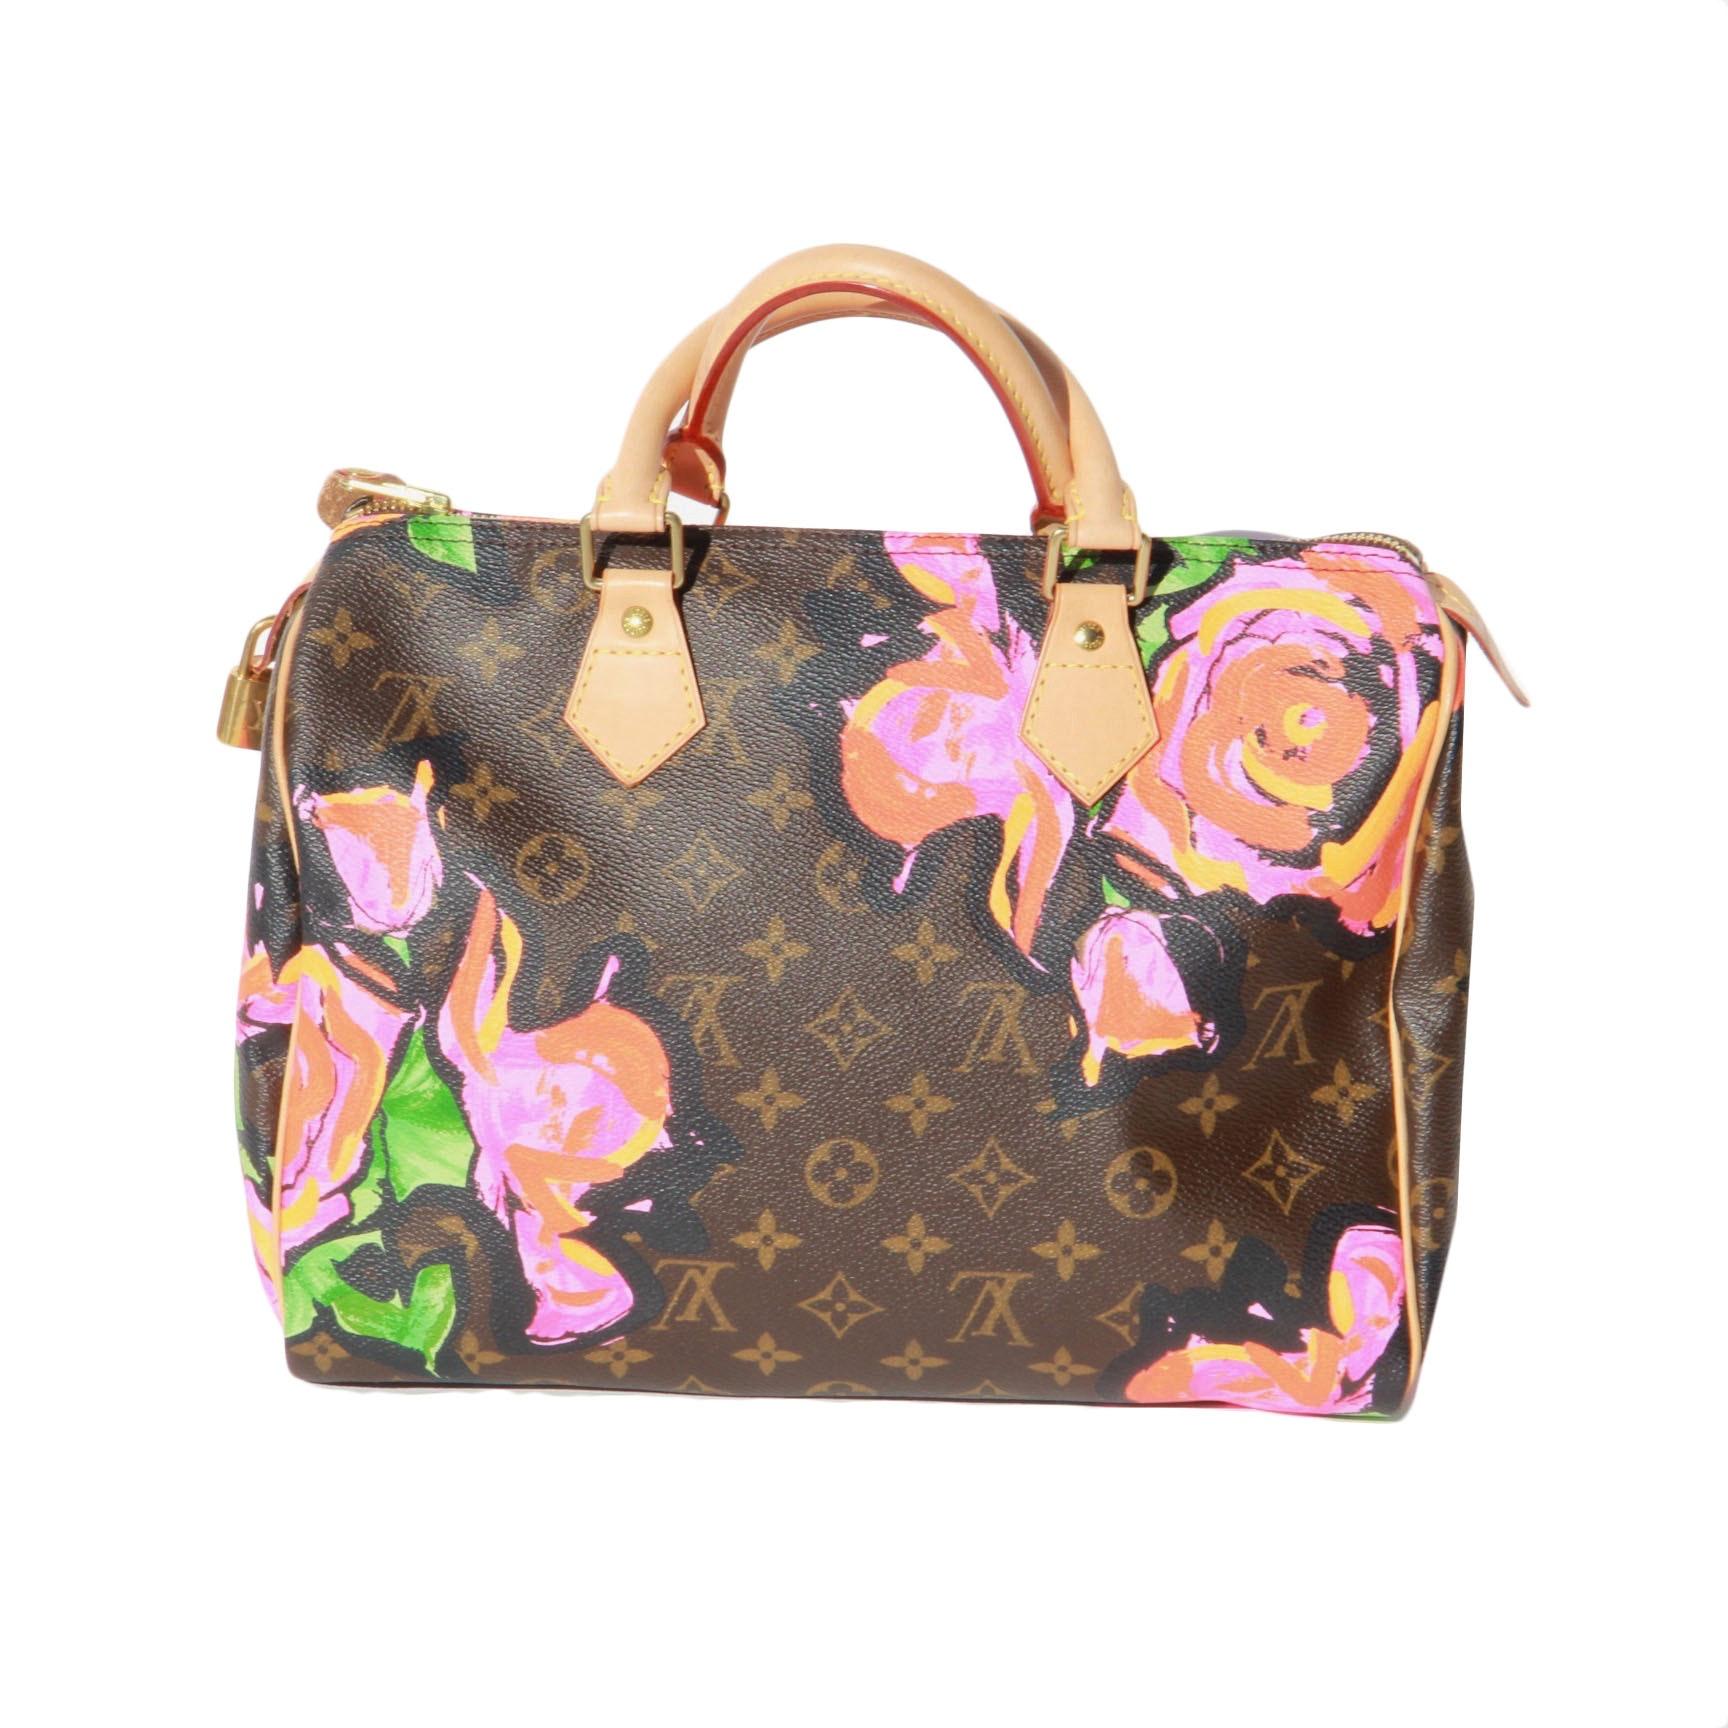 Louis Vuitton Stephen Sprouse Roses Speedy 30 Bag